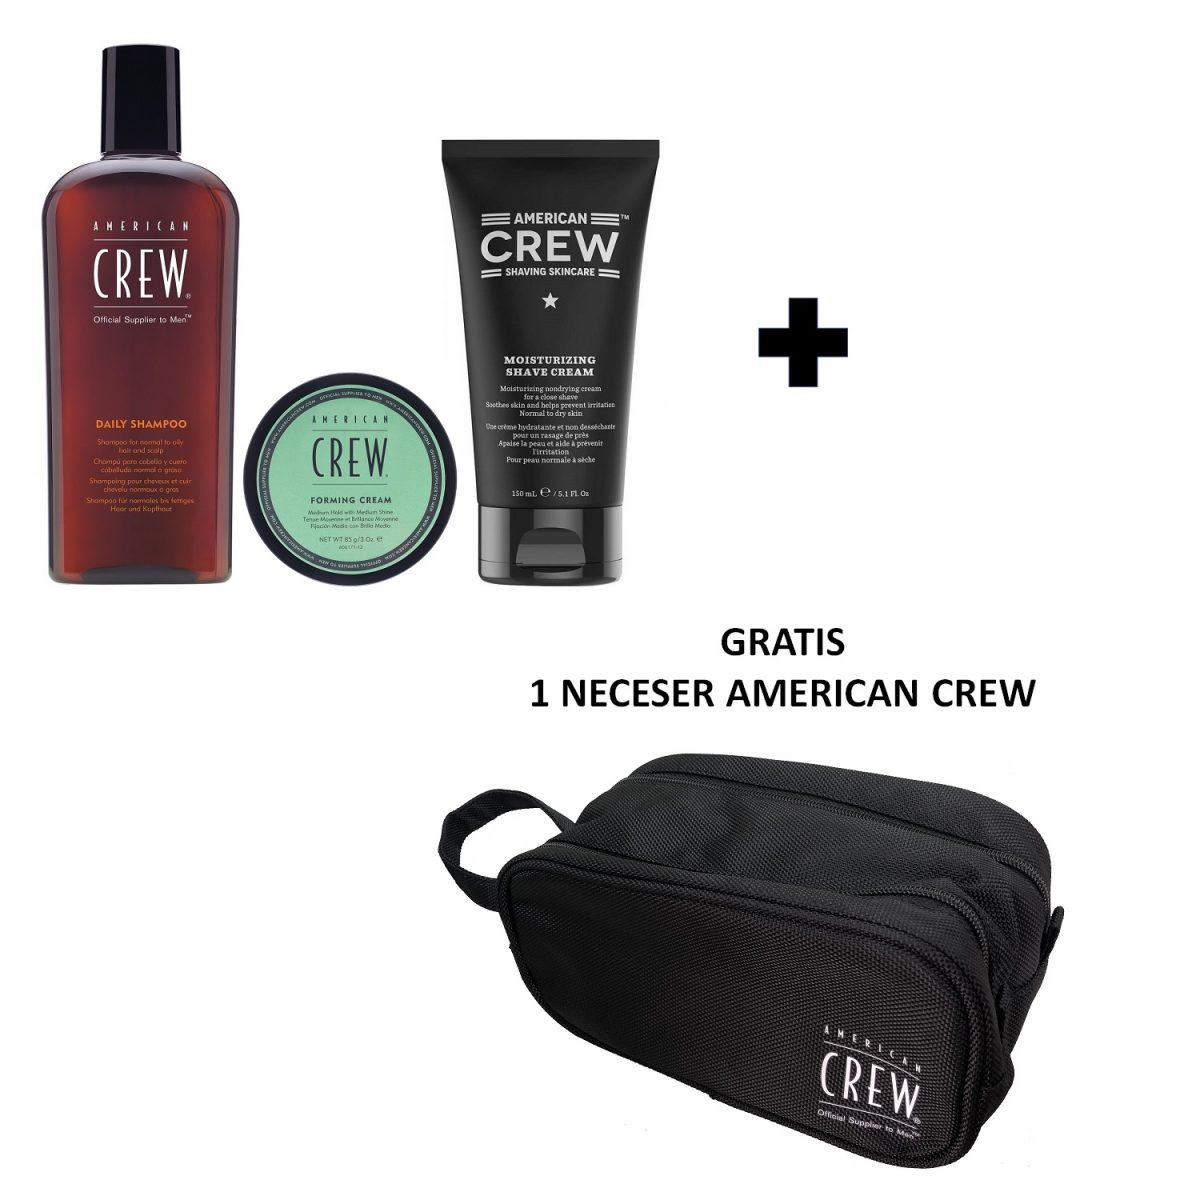 55_American-Crew-Daily-Shampoo-250ml_Forming_Cream_85gr_Moisturizing_Shave_Cream_150ml_Neceser